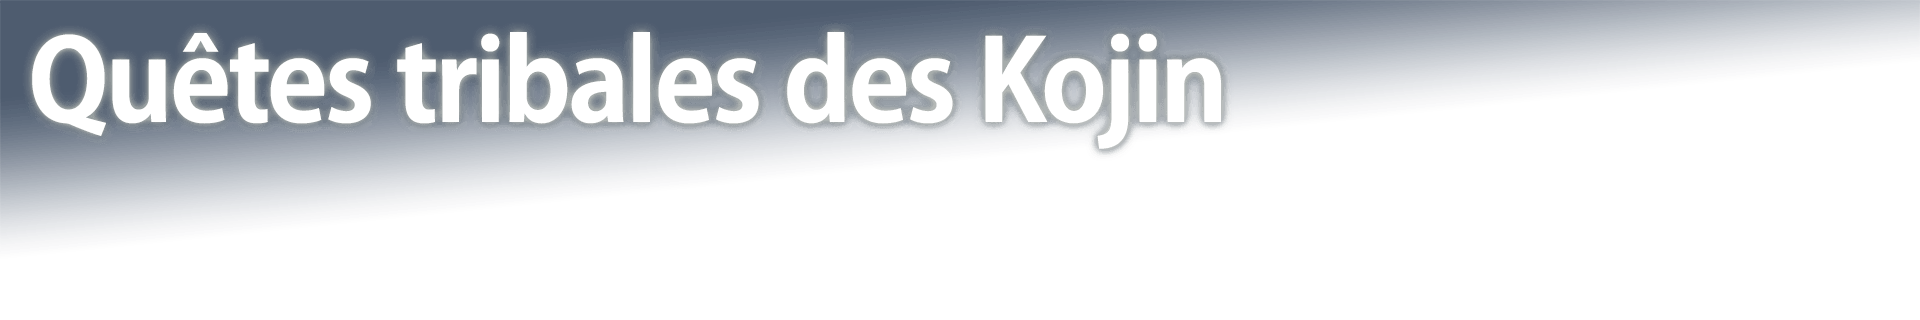 Quêtes tribales des Kojin